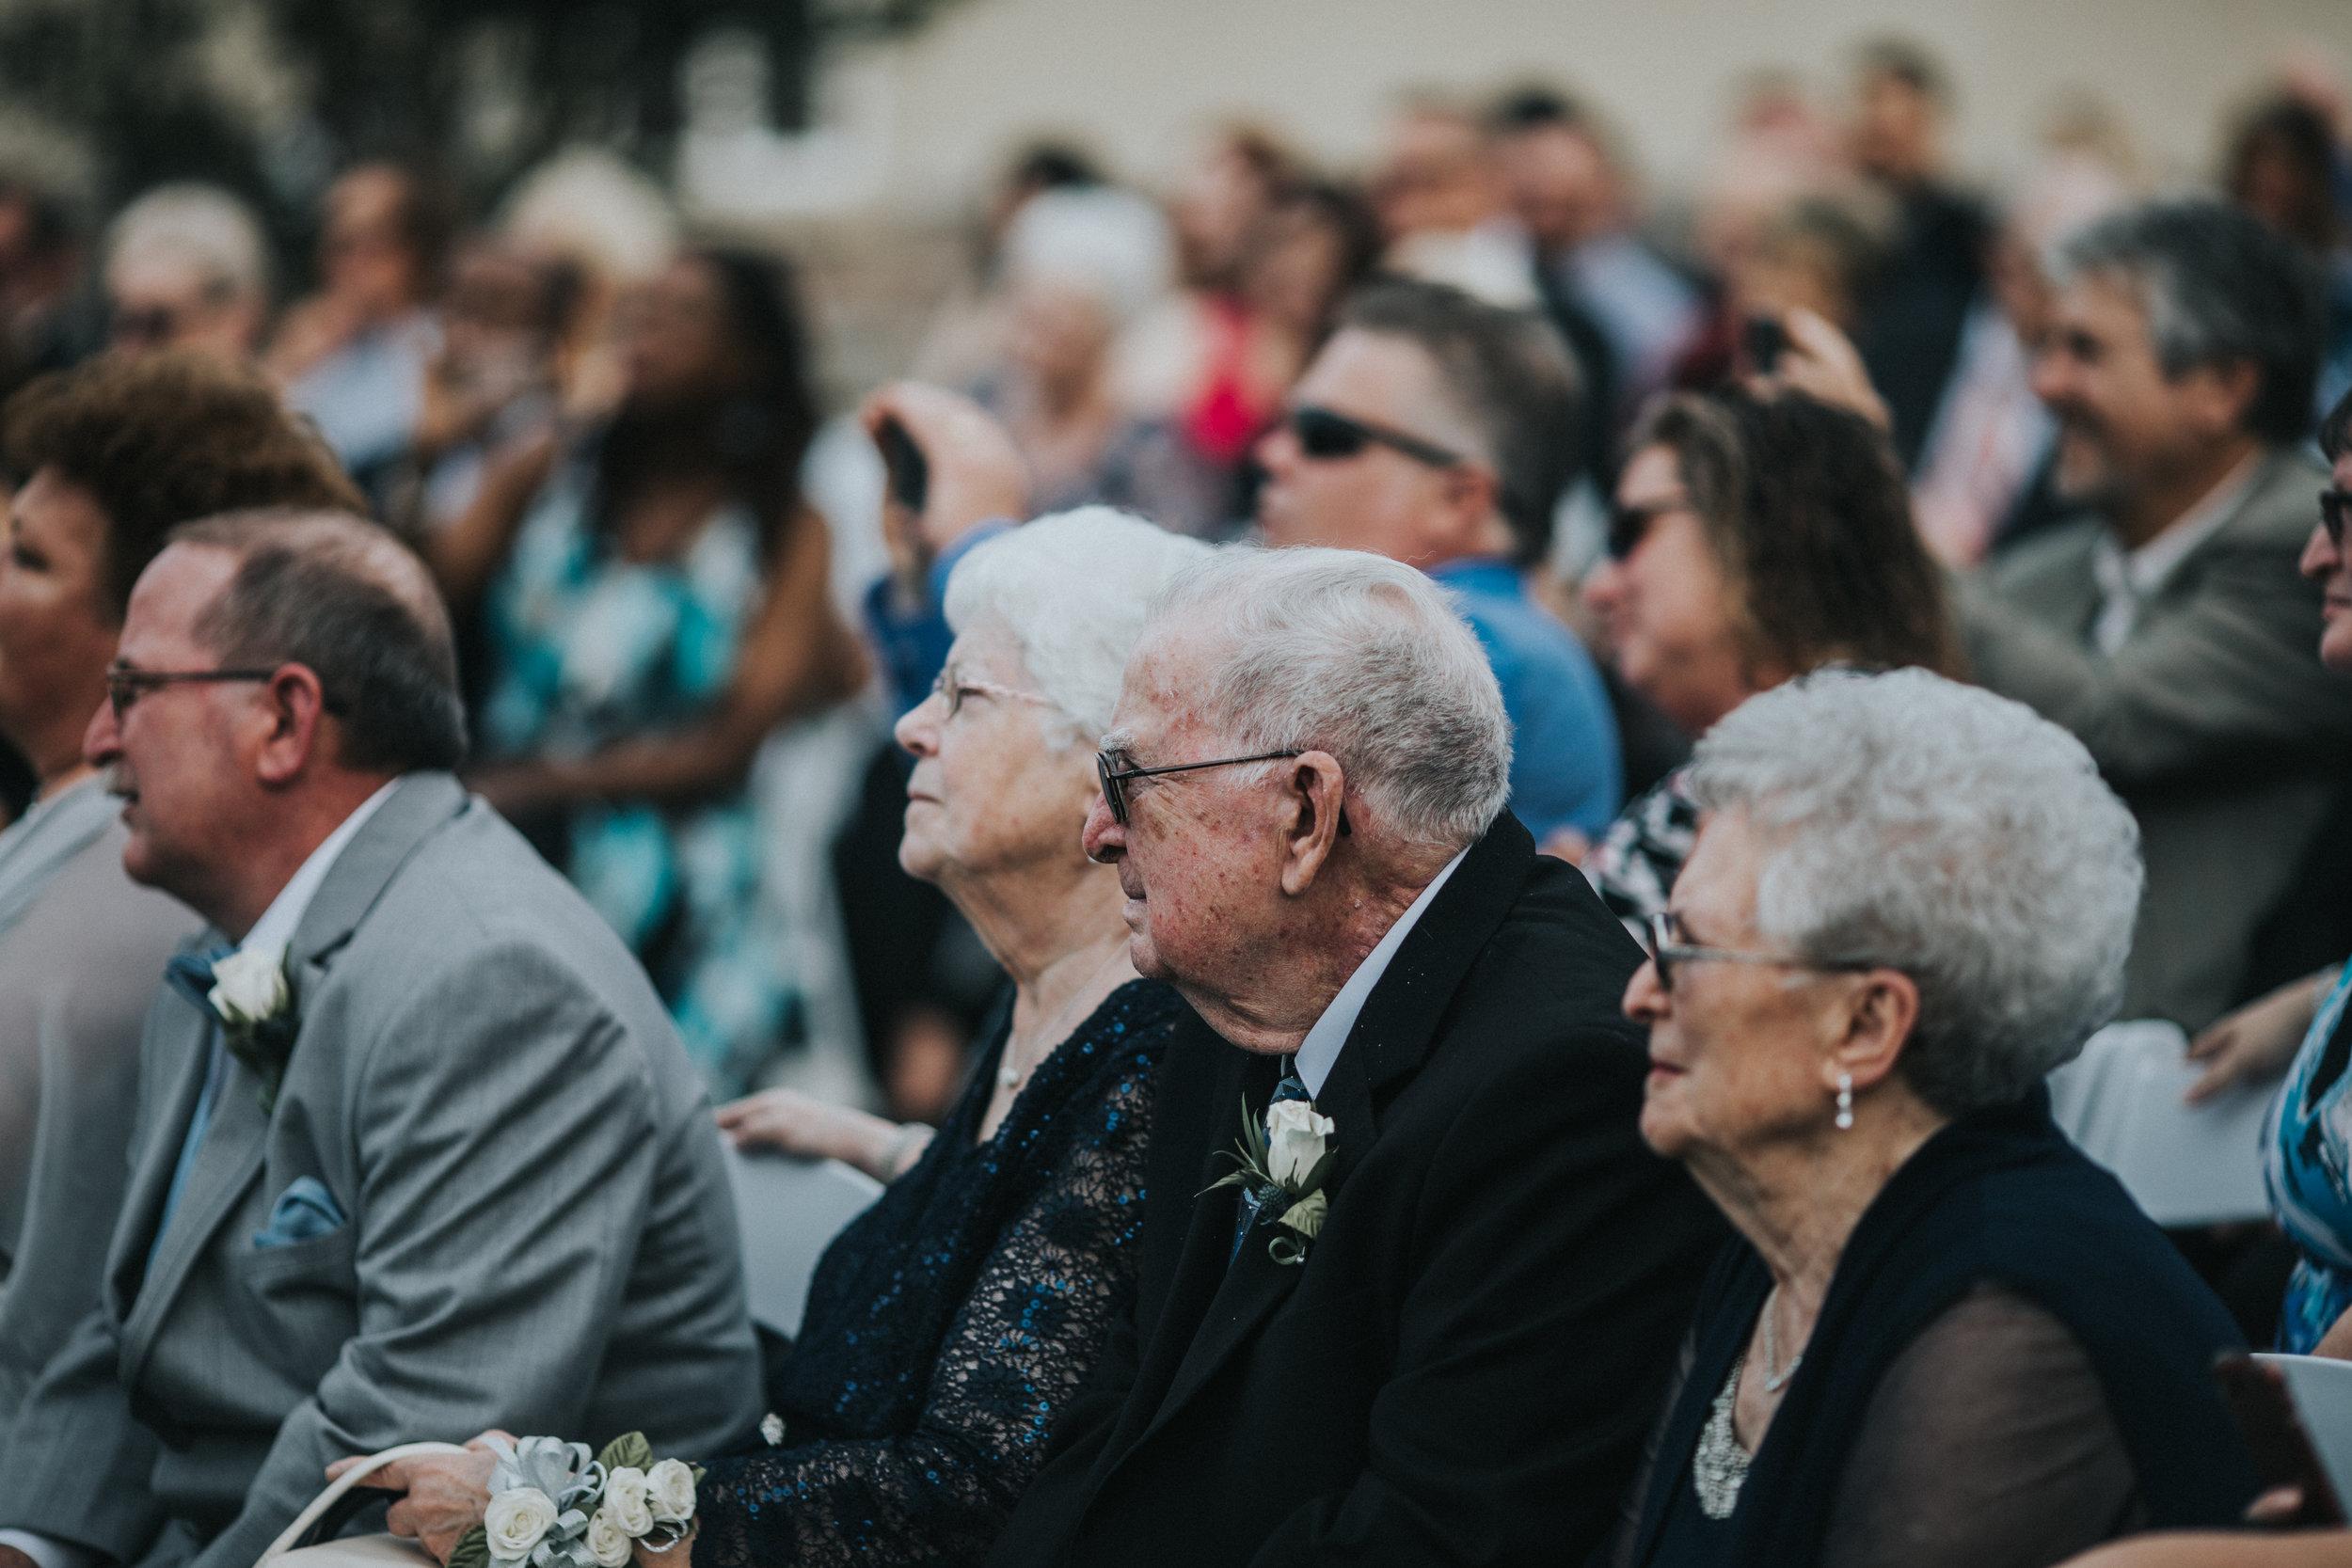 New-Jersey-Wedding-Photographer-JennaLynnPhotography-ValenzanoWinery-Ceremony-107.jpg